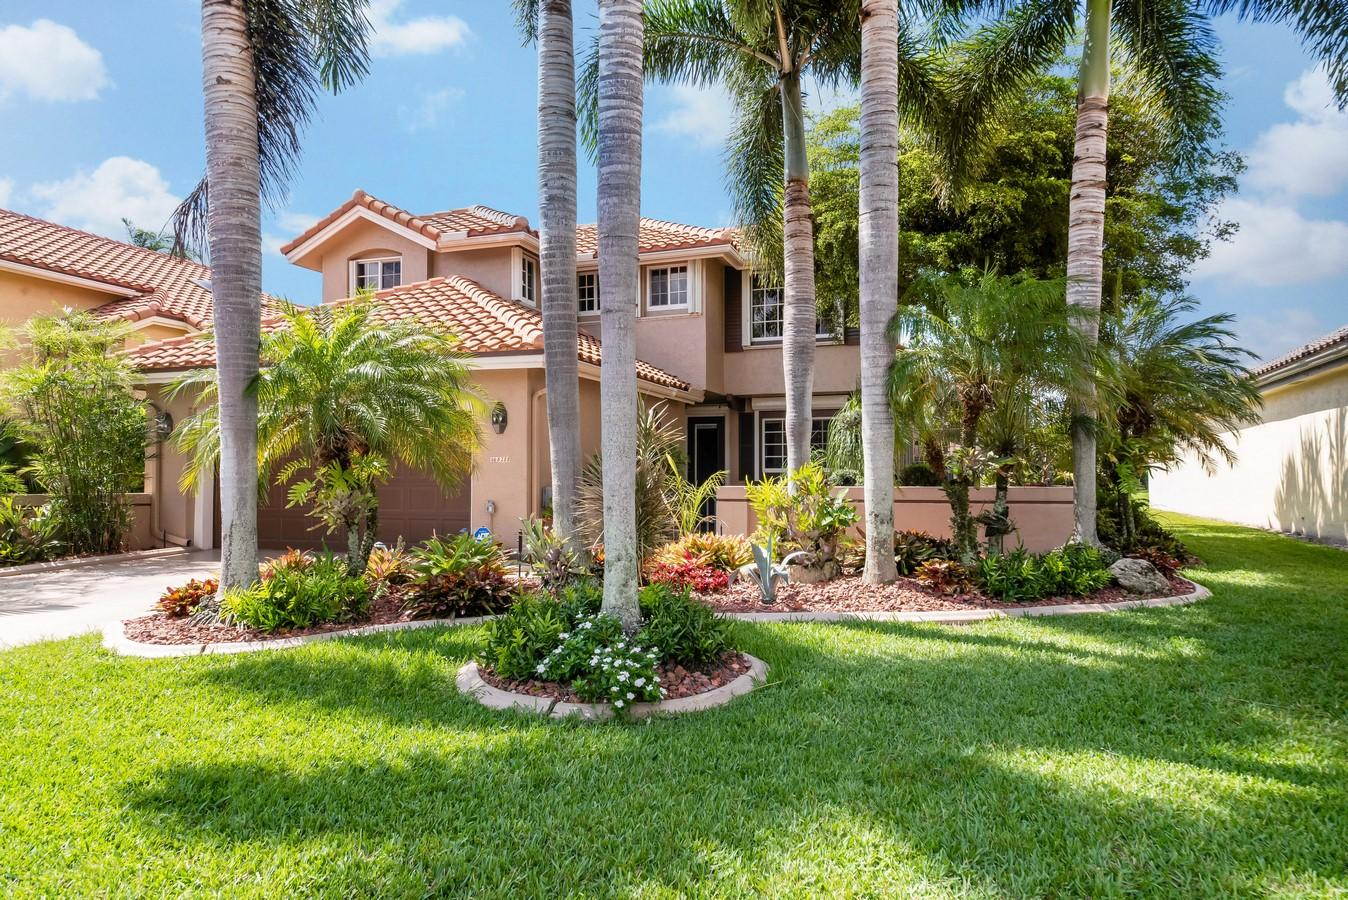 Home for sale in Santa Barbara Boca Raton Florida